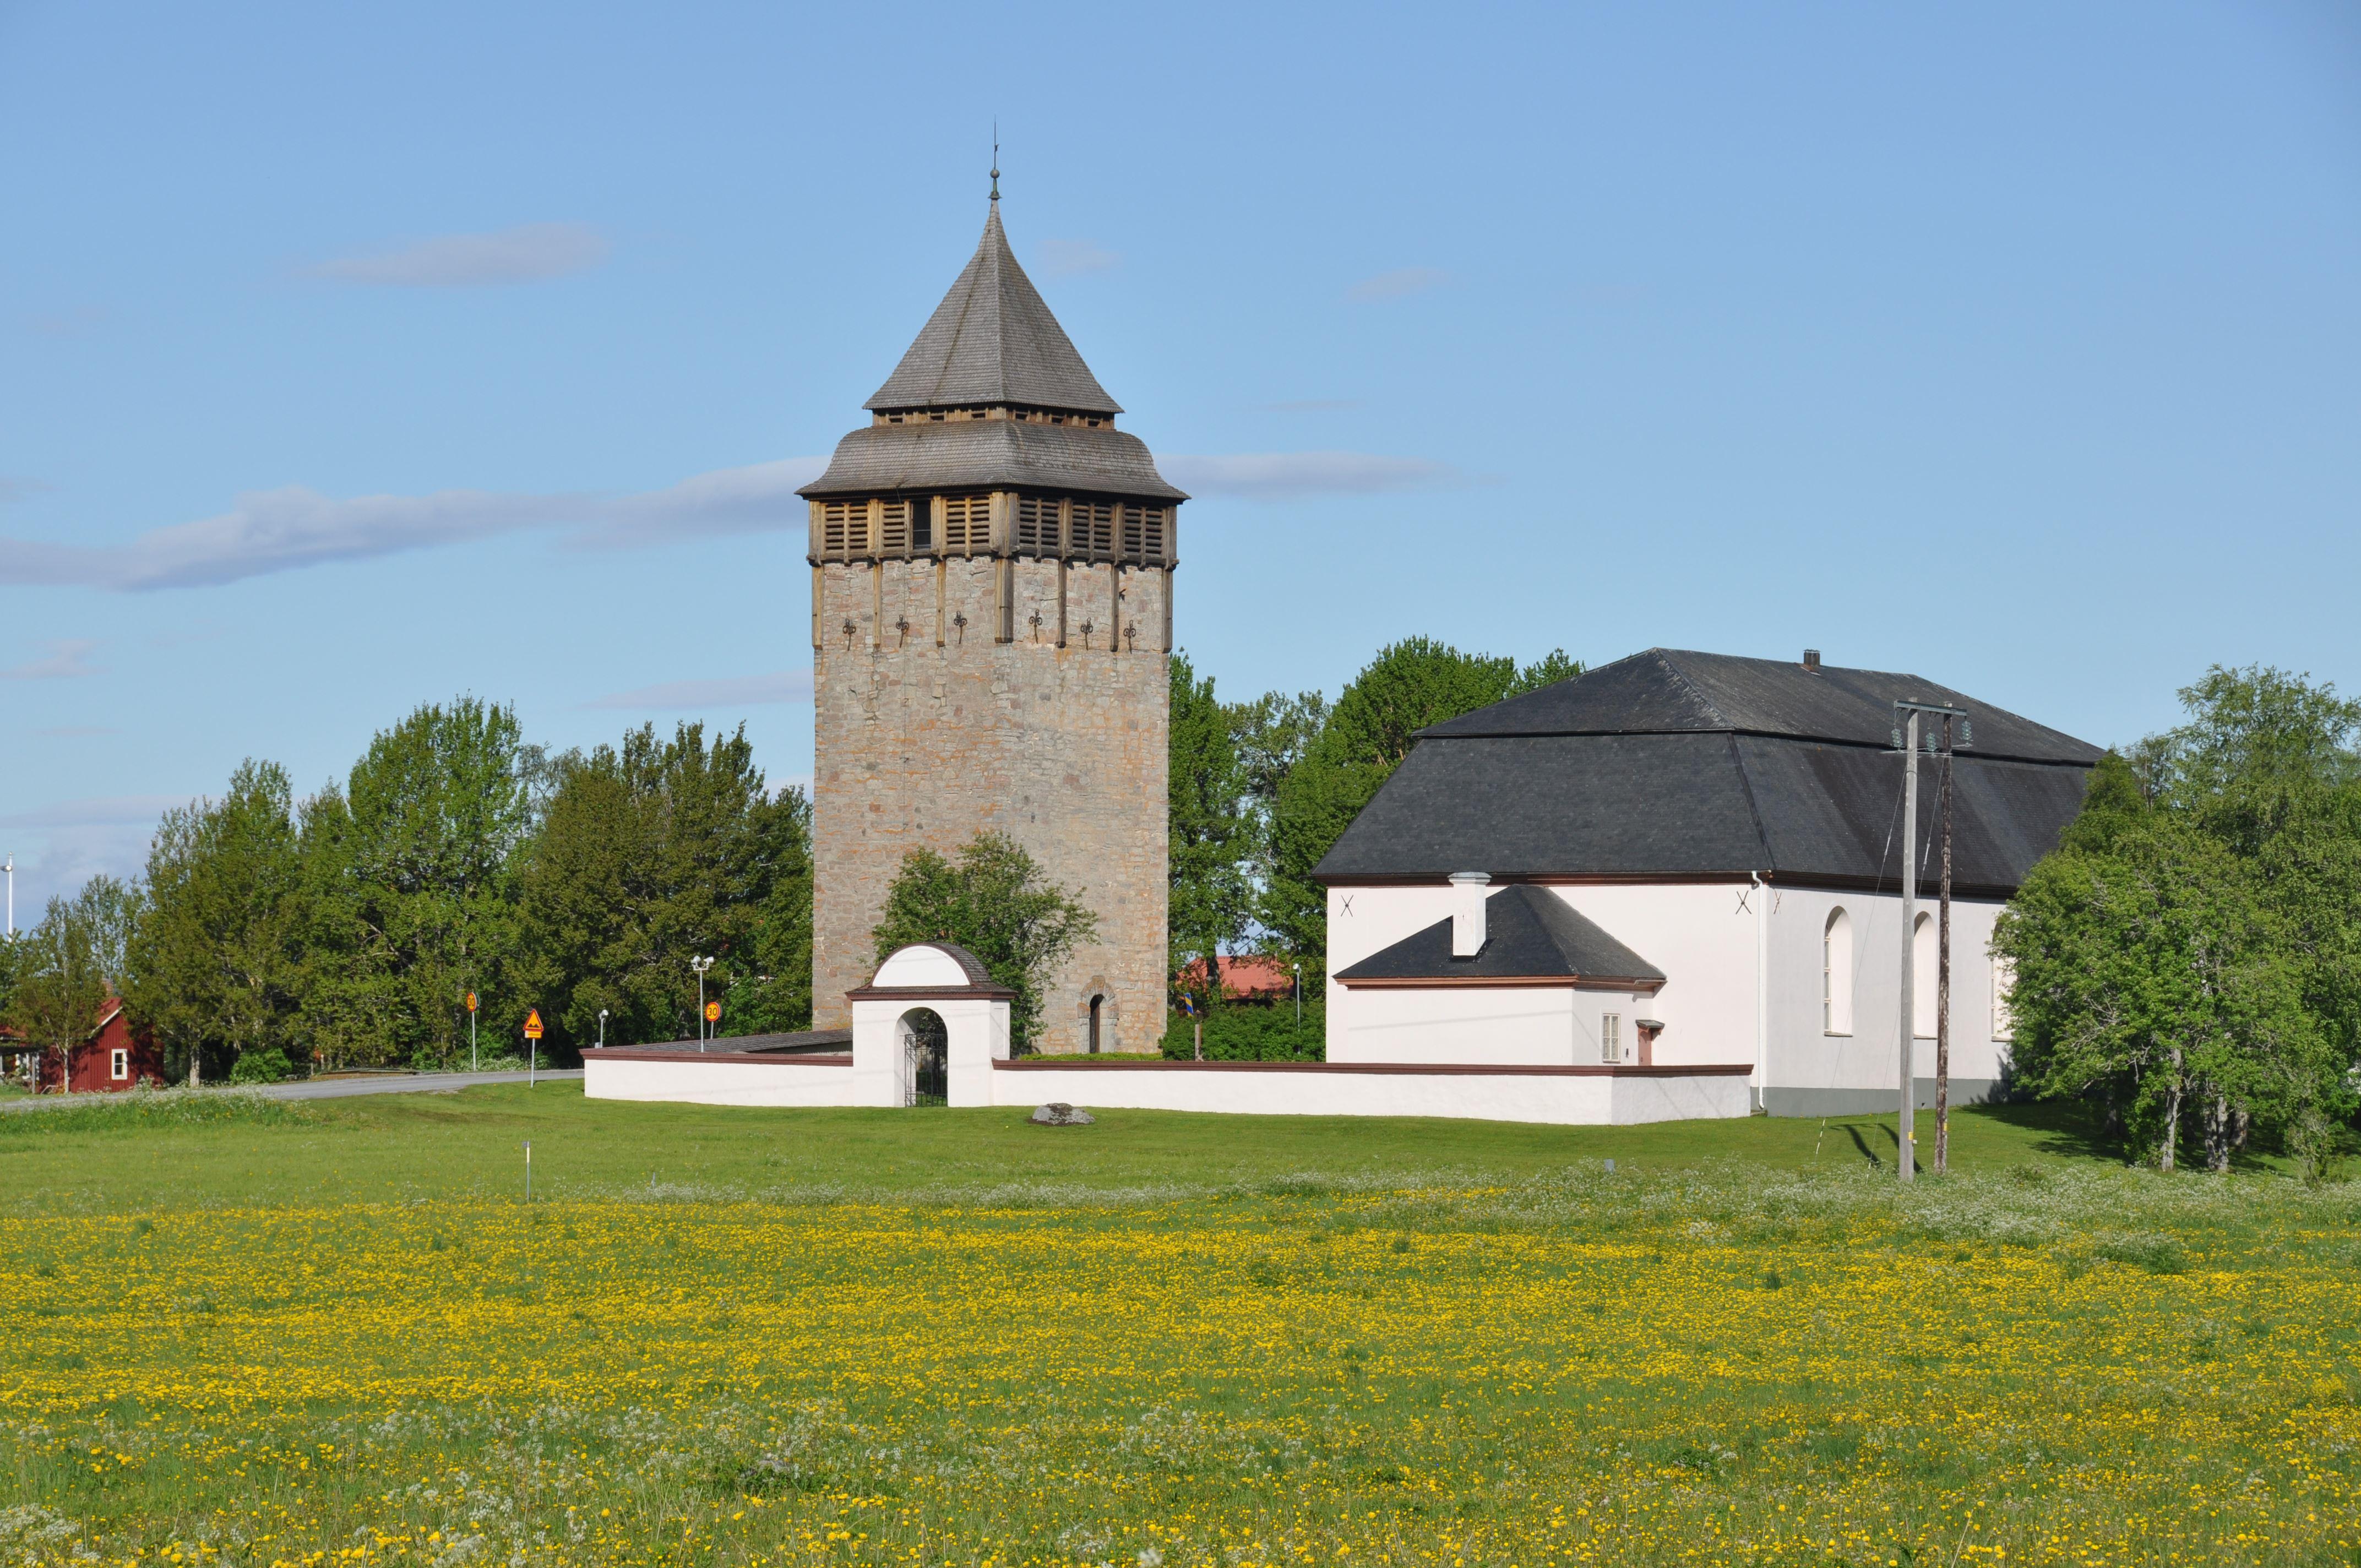 Brunflo Church & Defense Tower